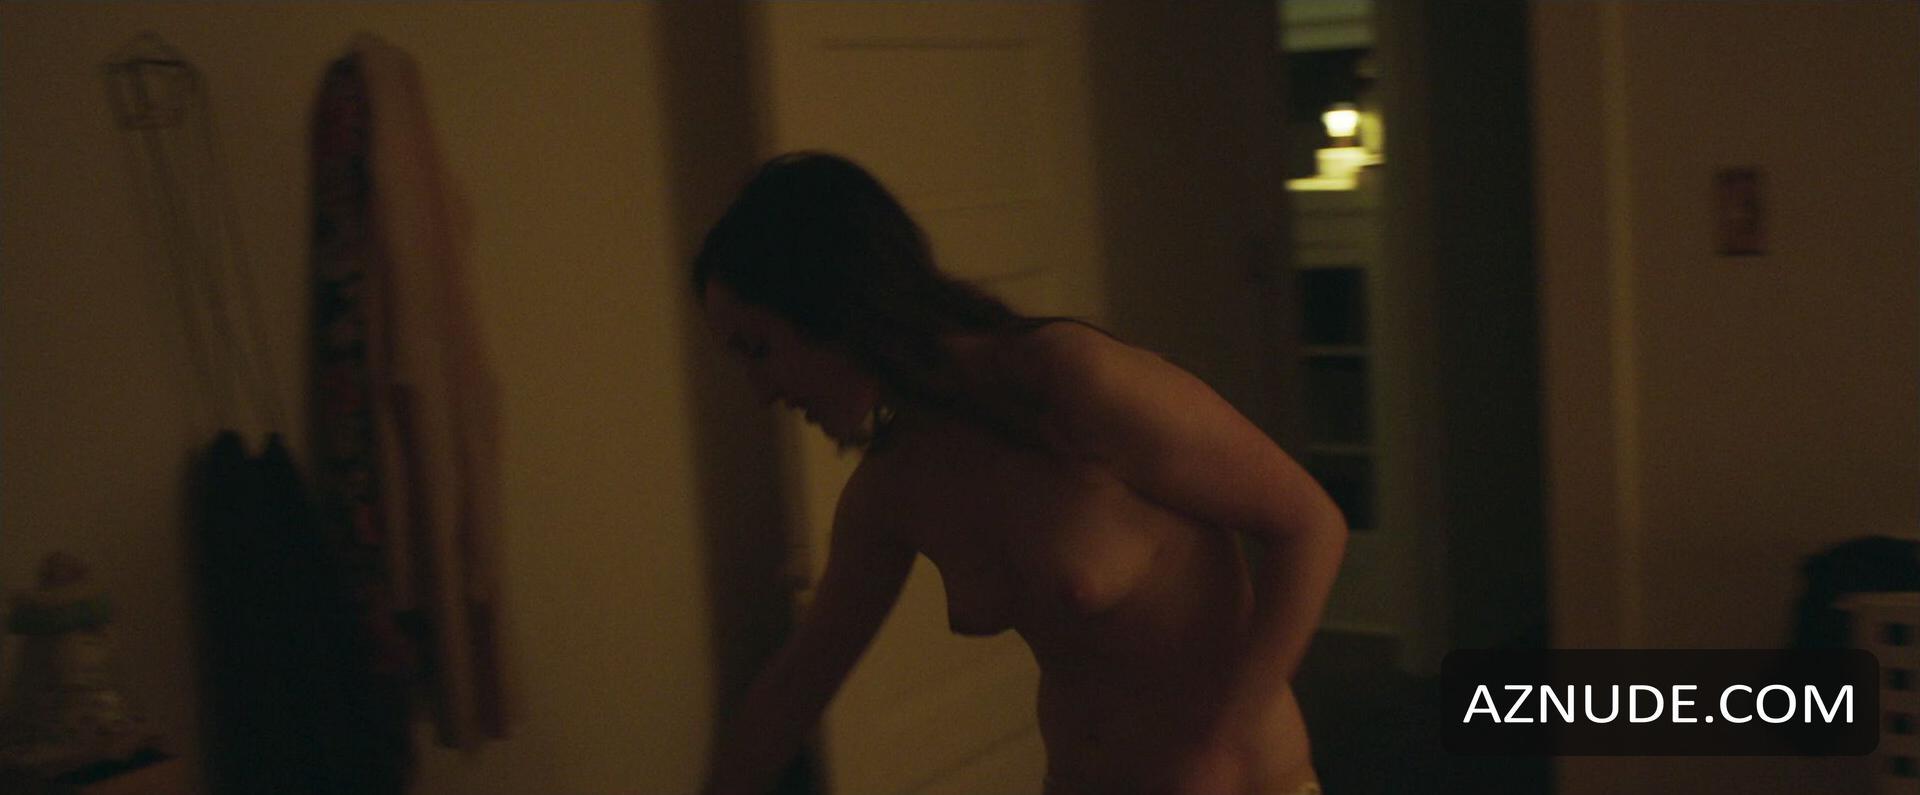 Zoe lister-jones nude